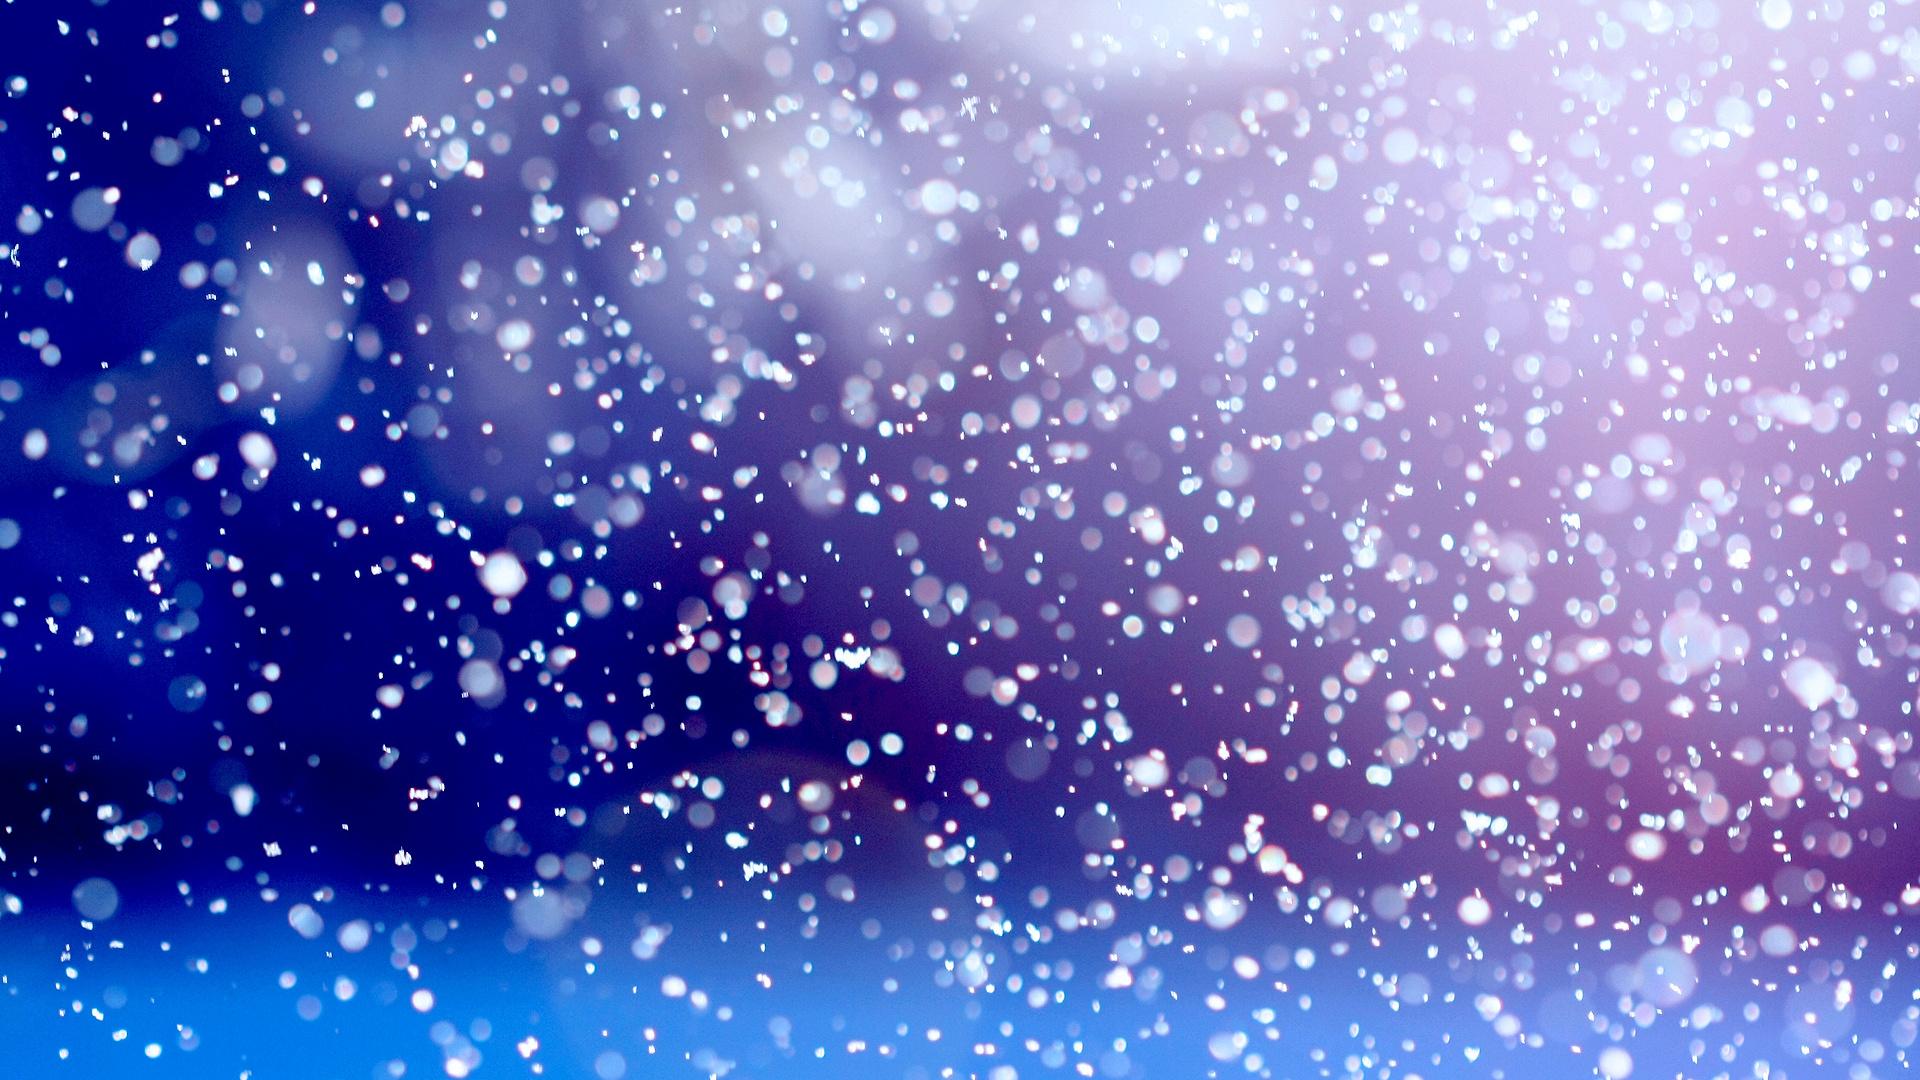 картинки летящий снег стоят трубке